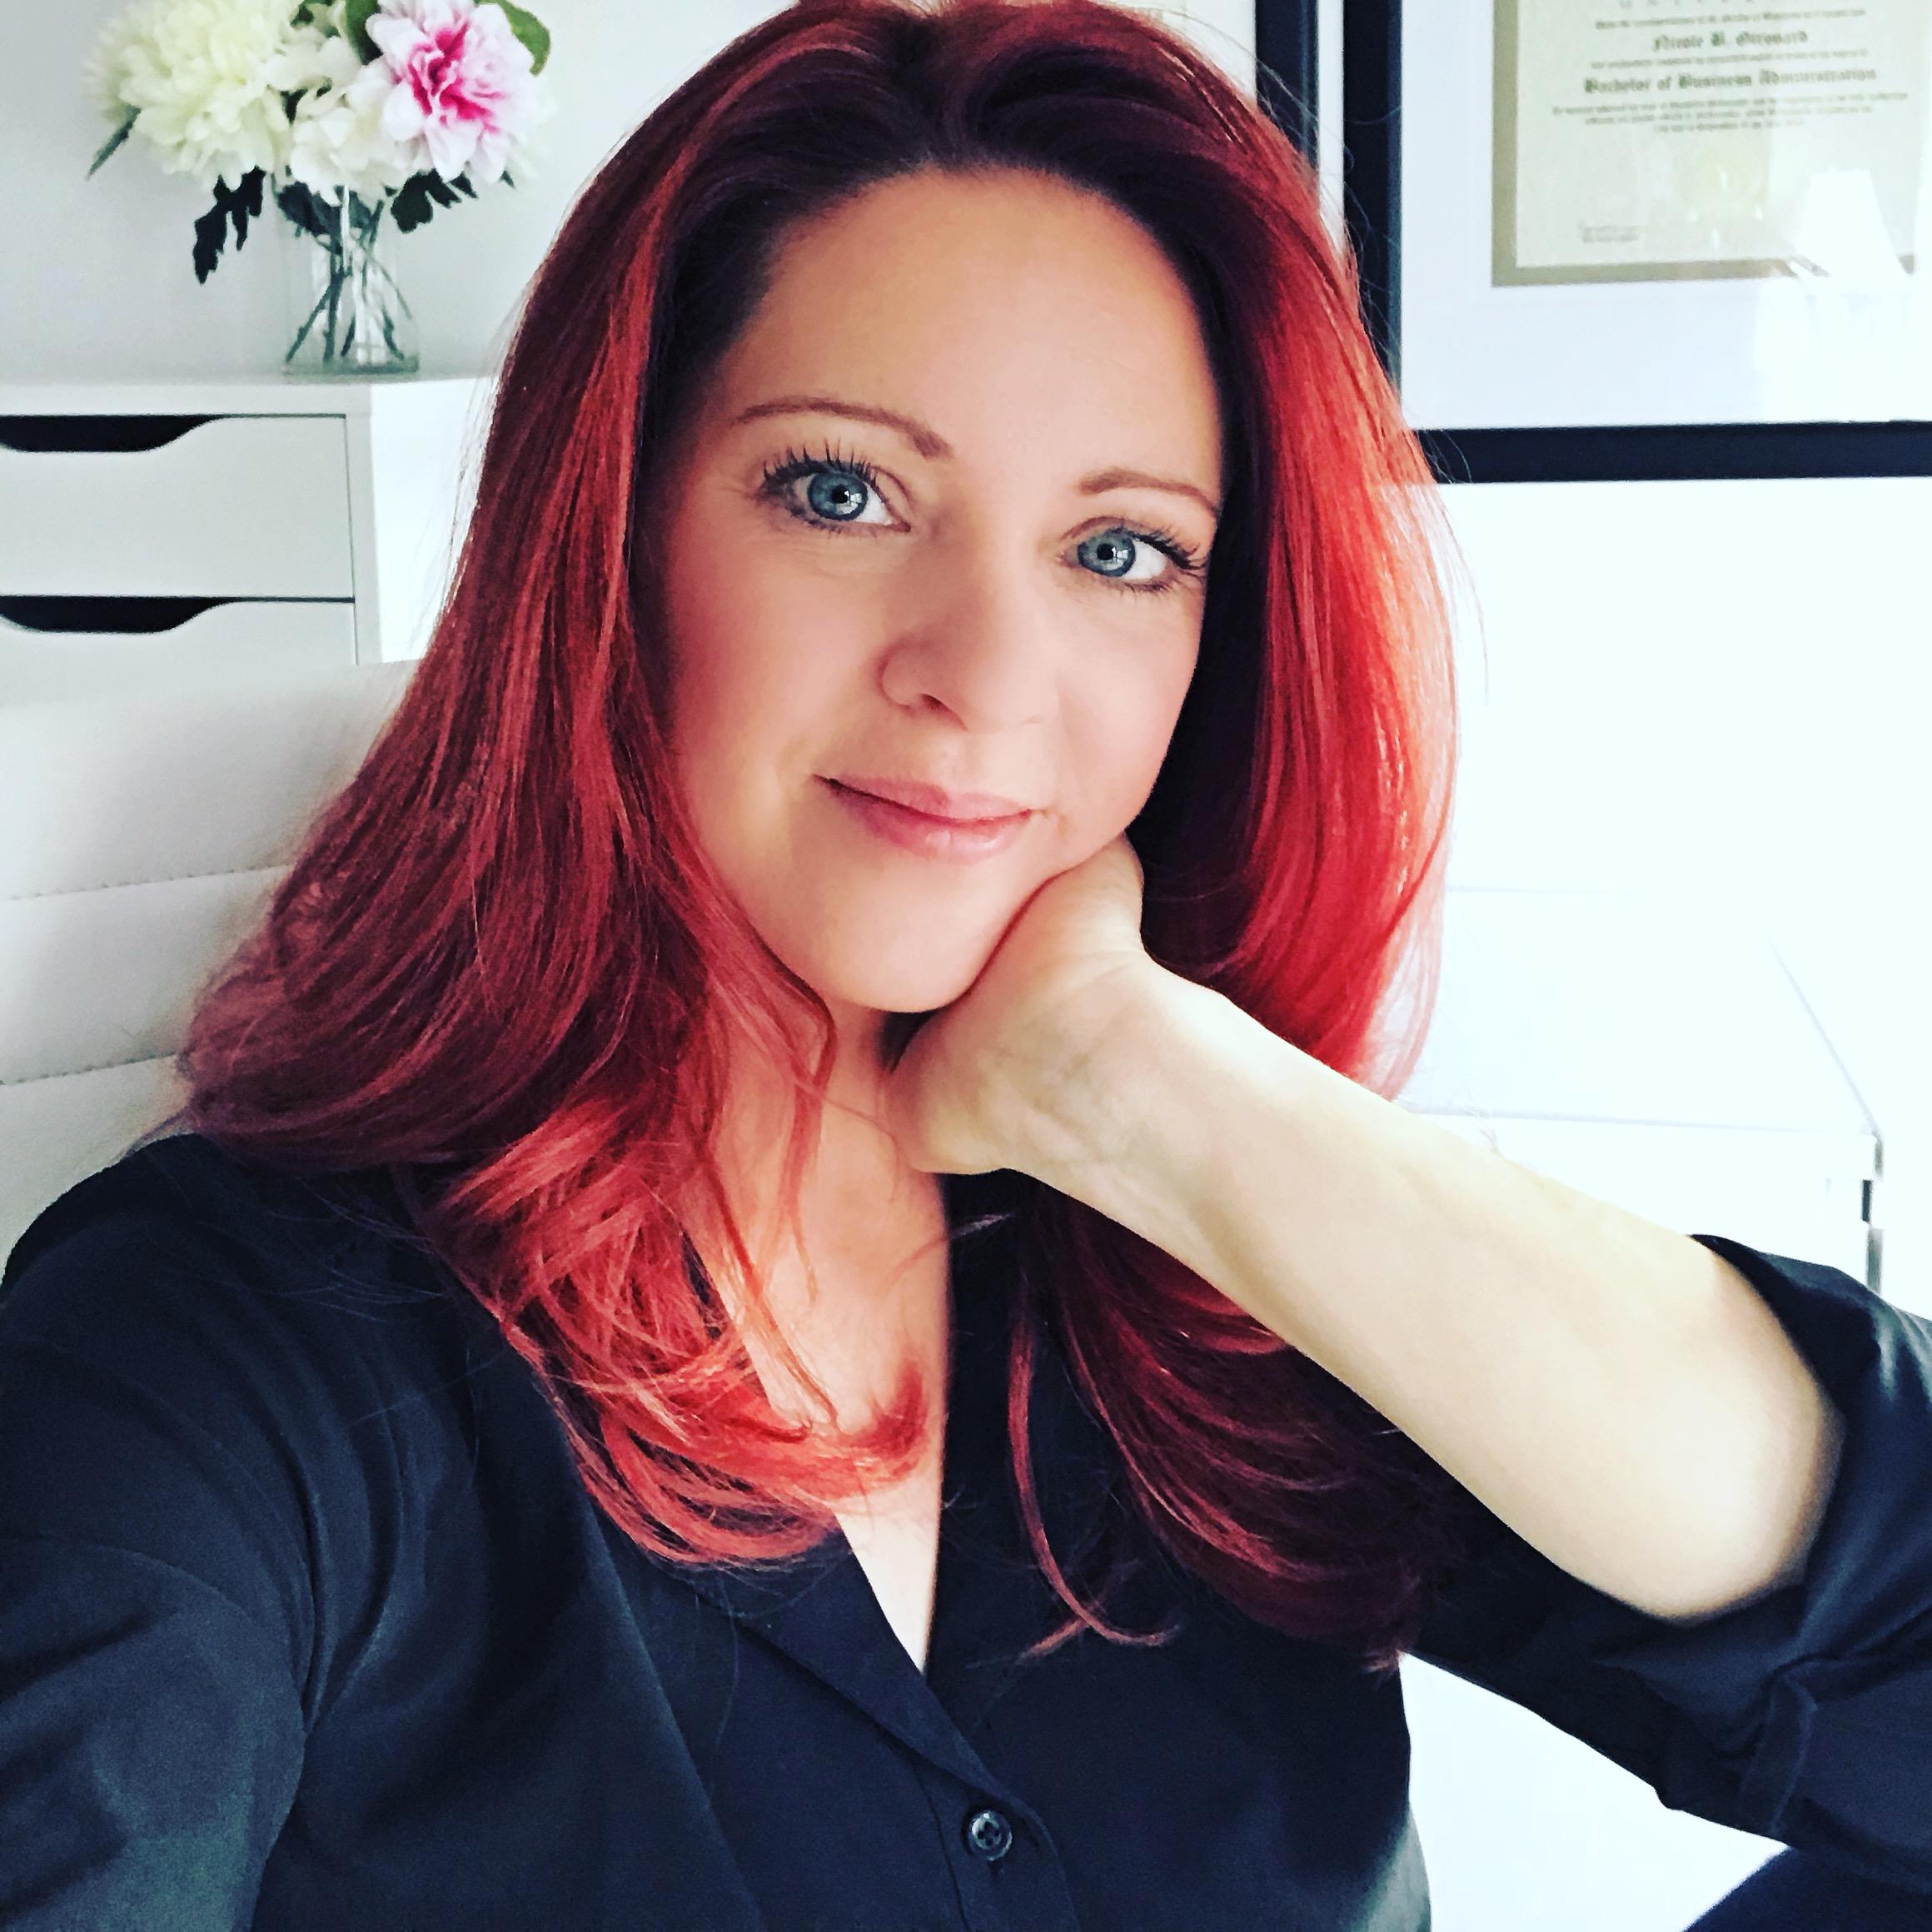 Nicole Girouard, BBA